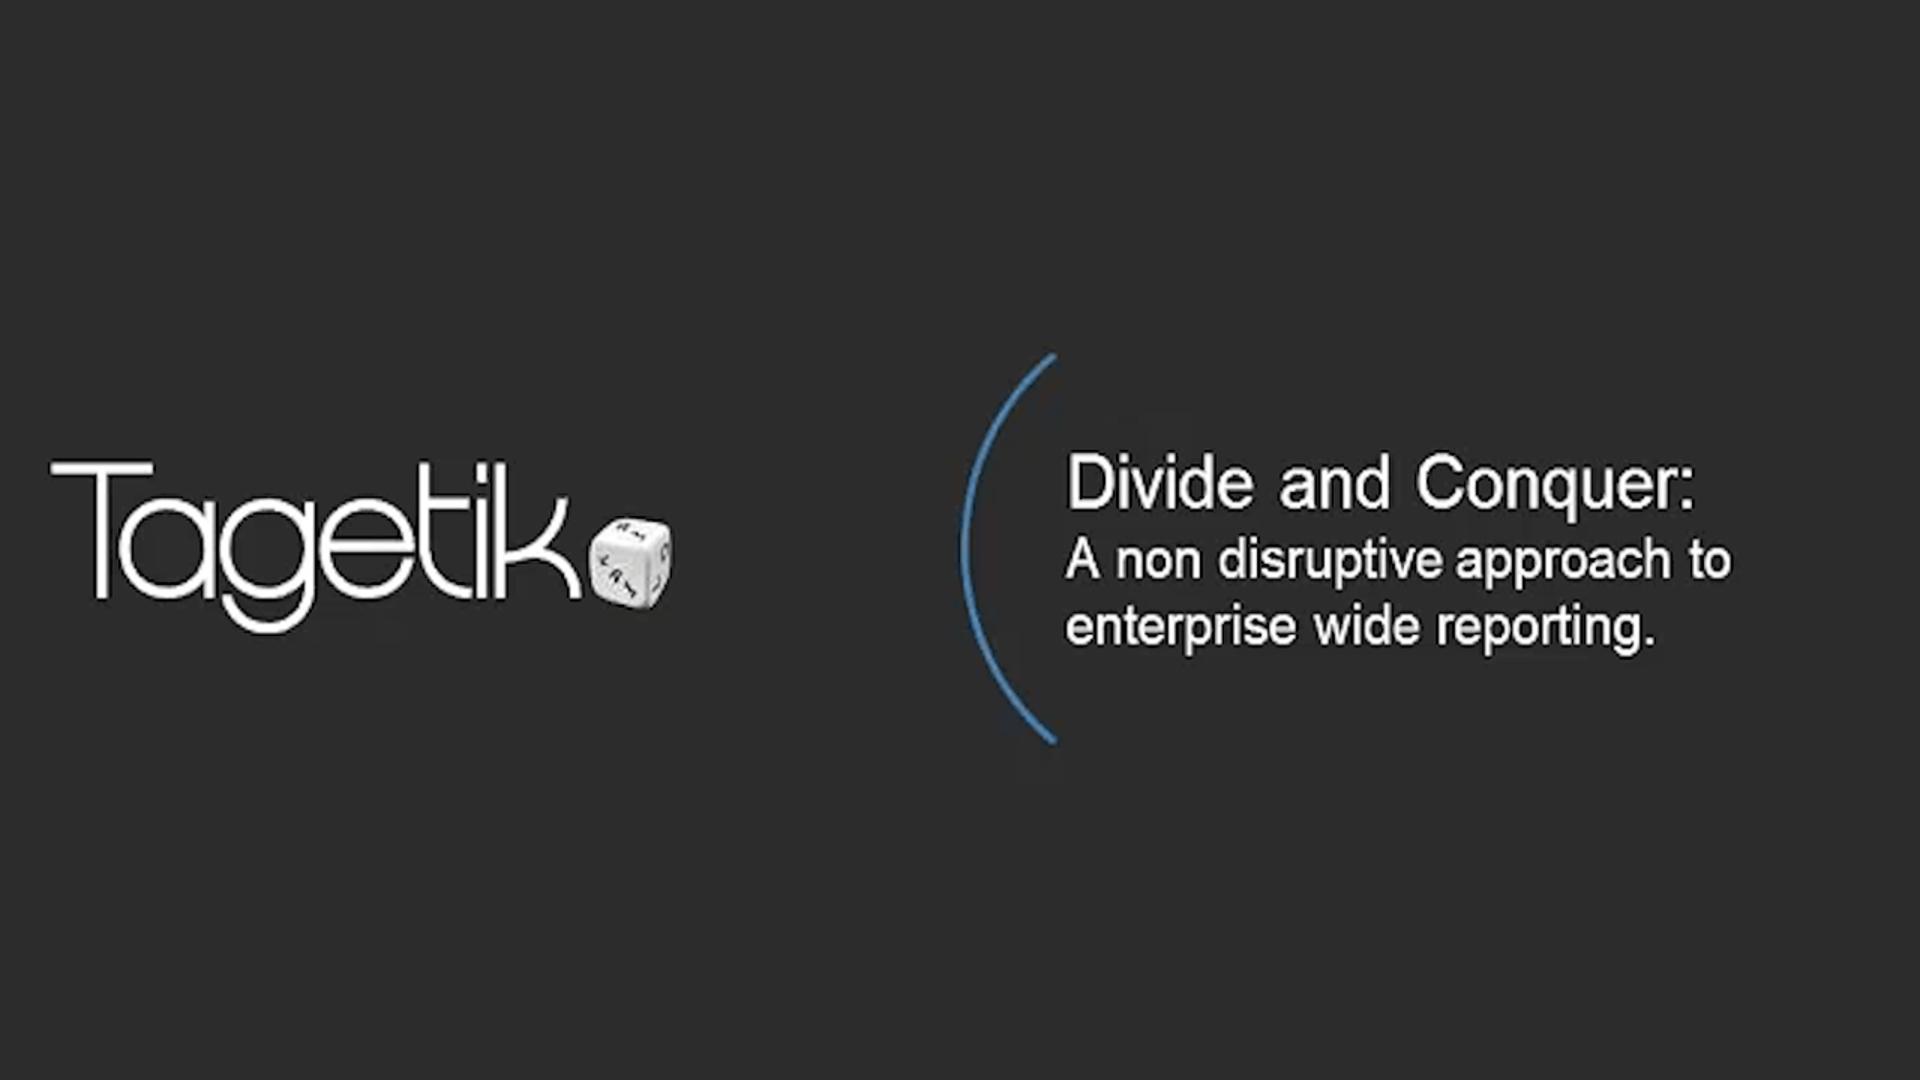 collaborative-approach-to-non-disruptive-reporting